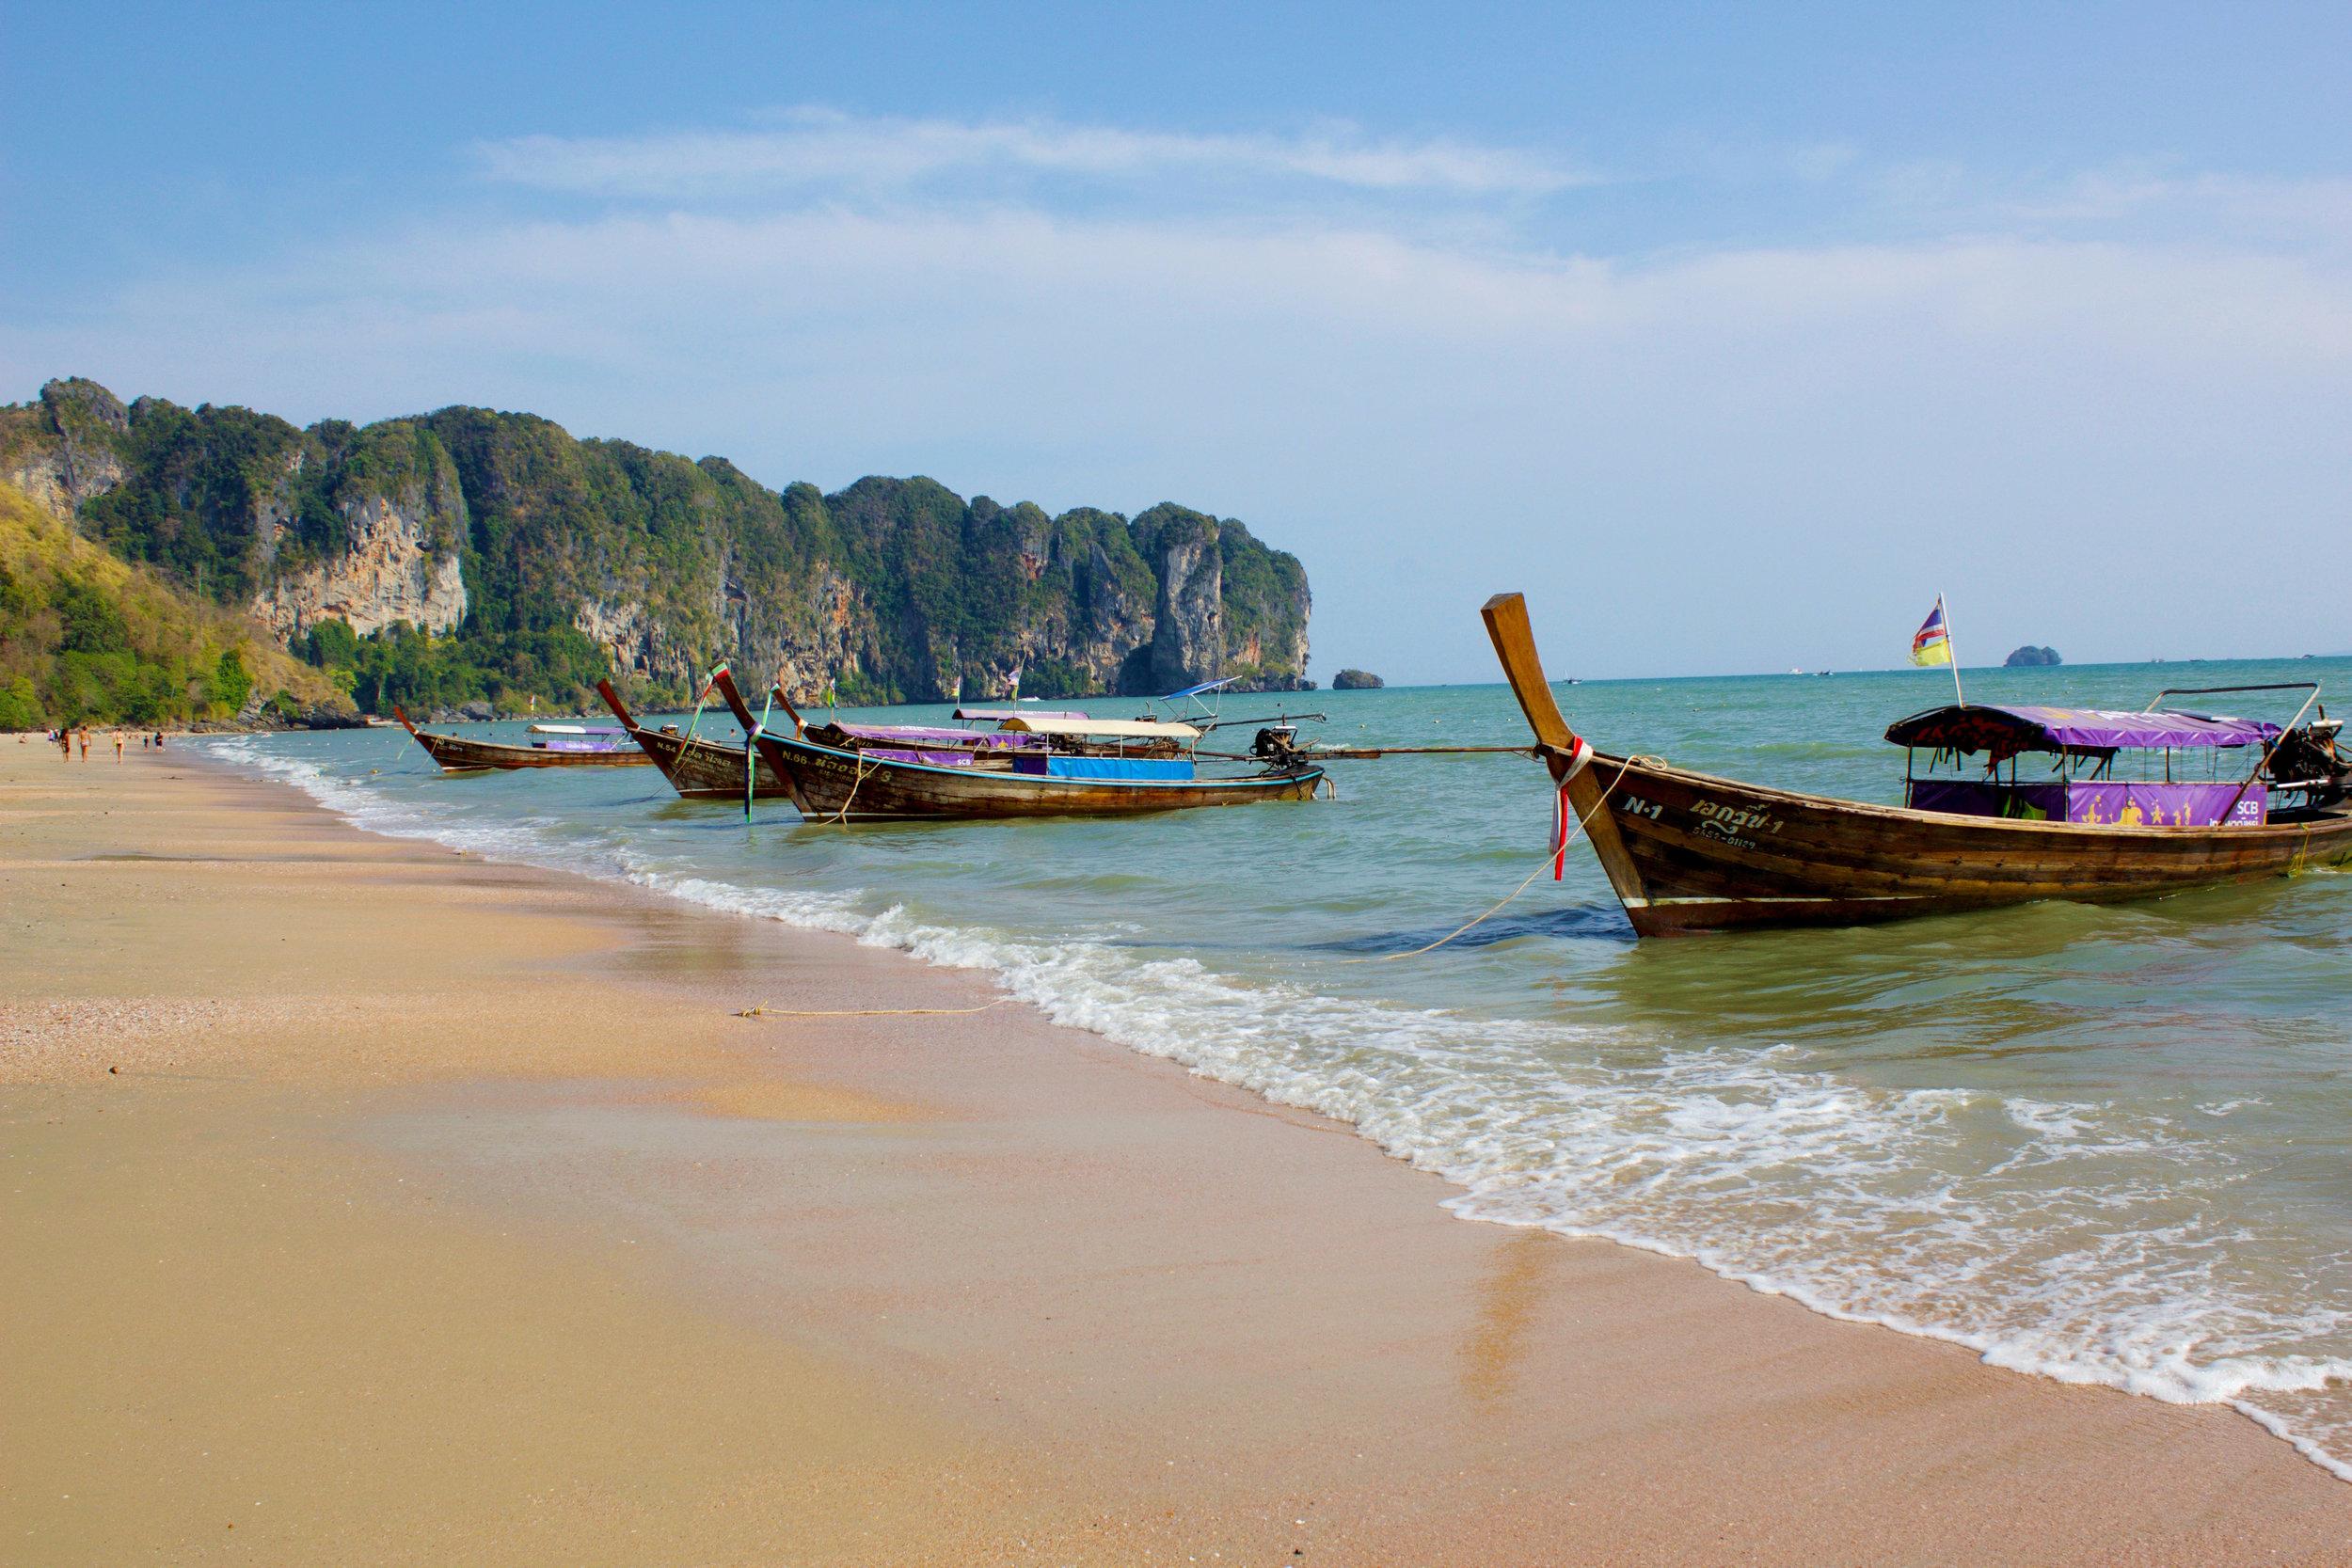 The beach in Ao Nang